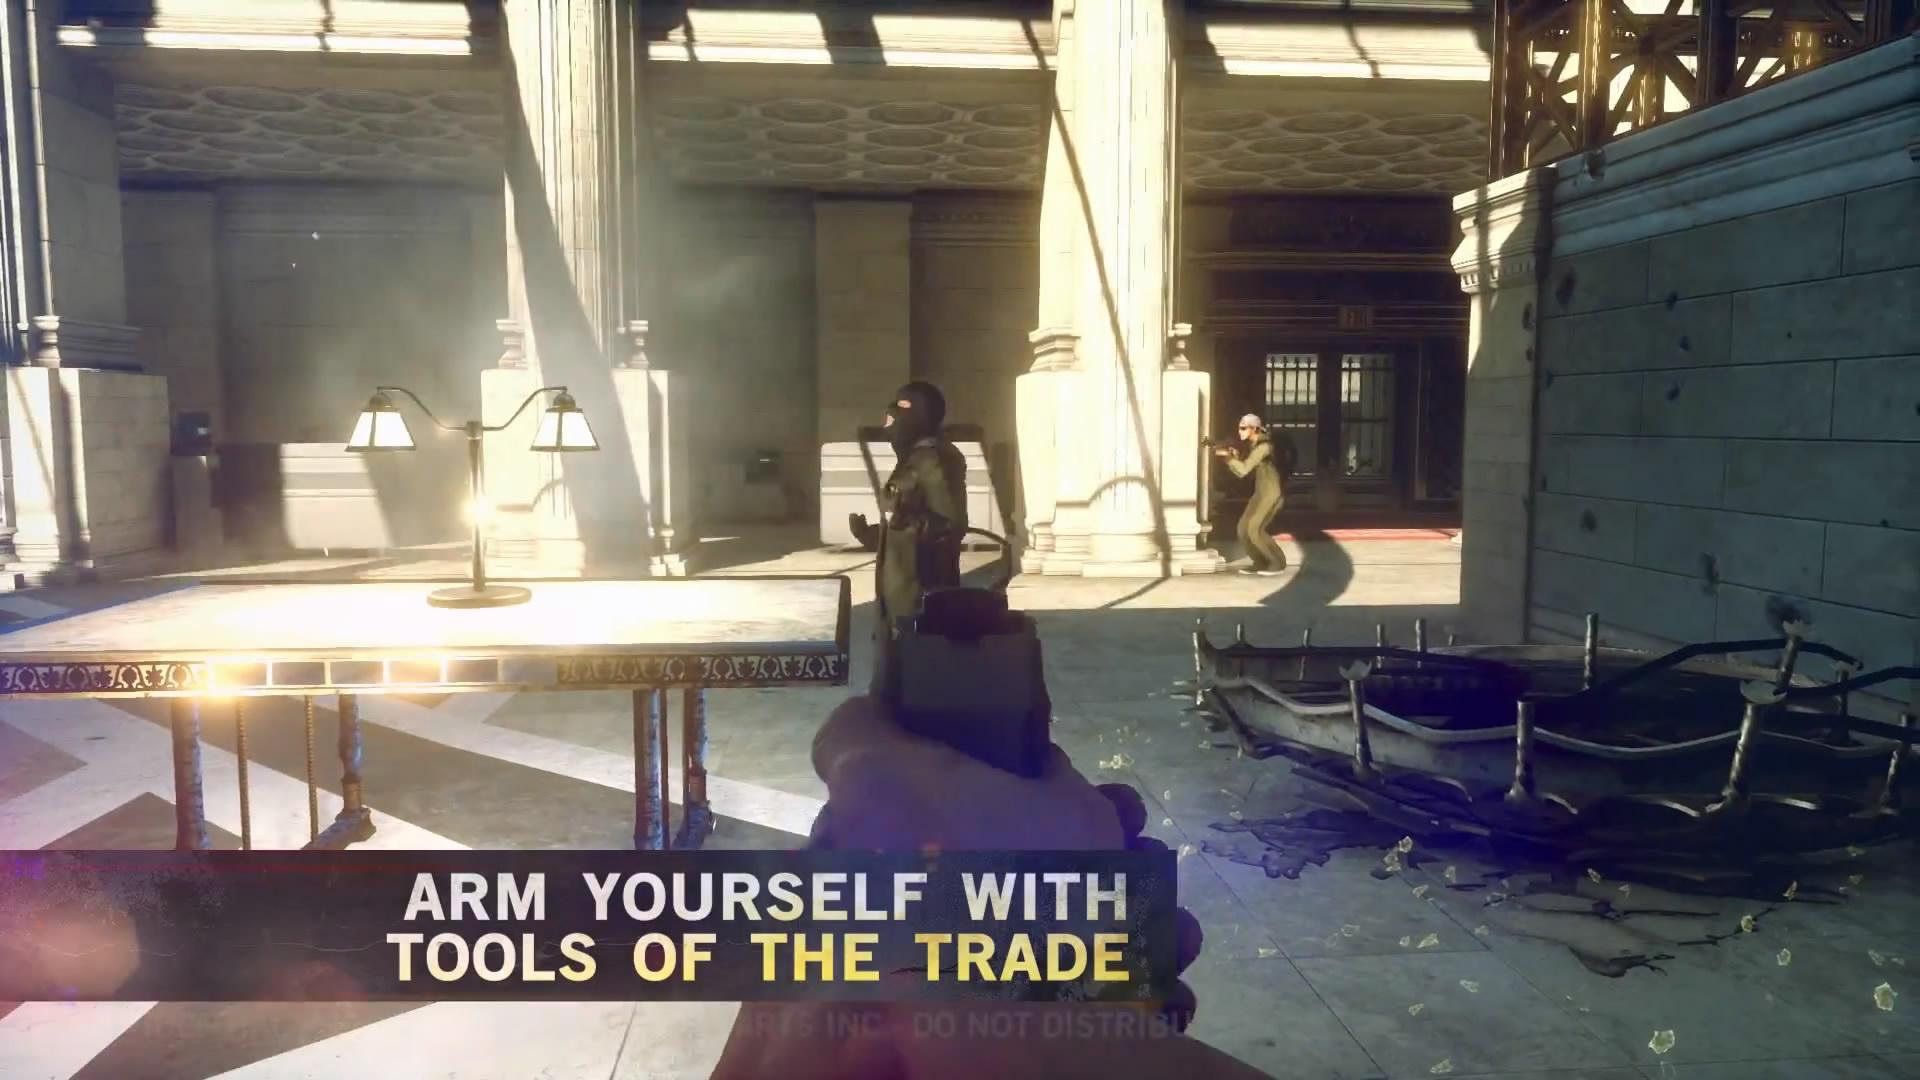 Battlefield-Hardline-Real-Gameplay.mp4_snapshot_04.57_2014.05.28_12.49.03